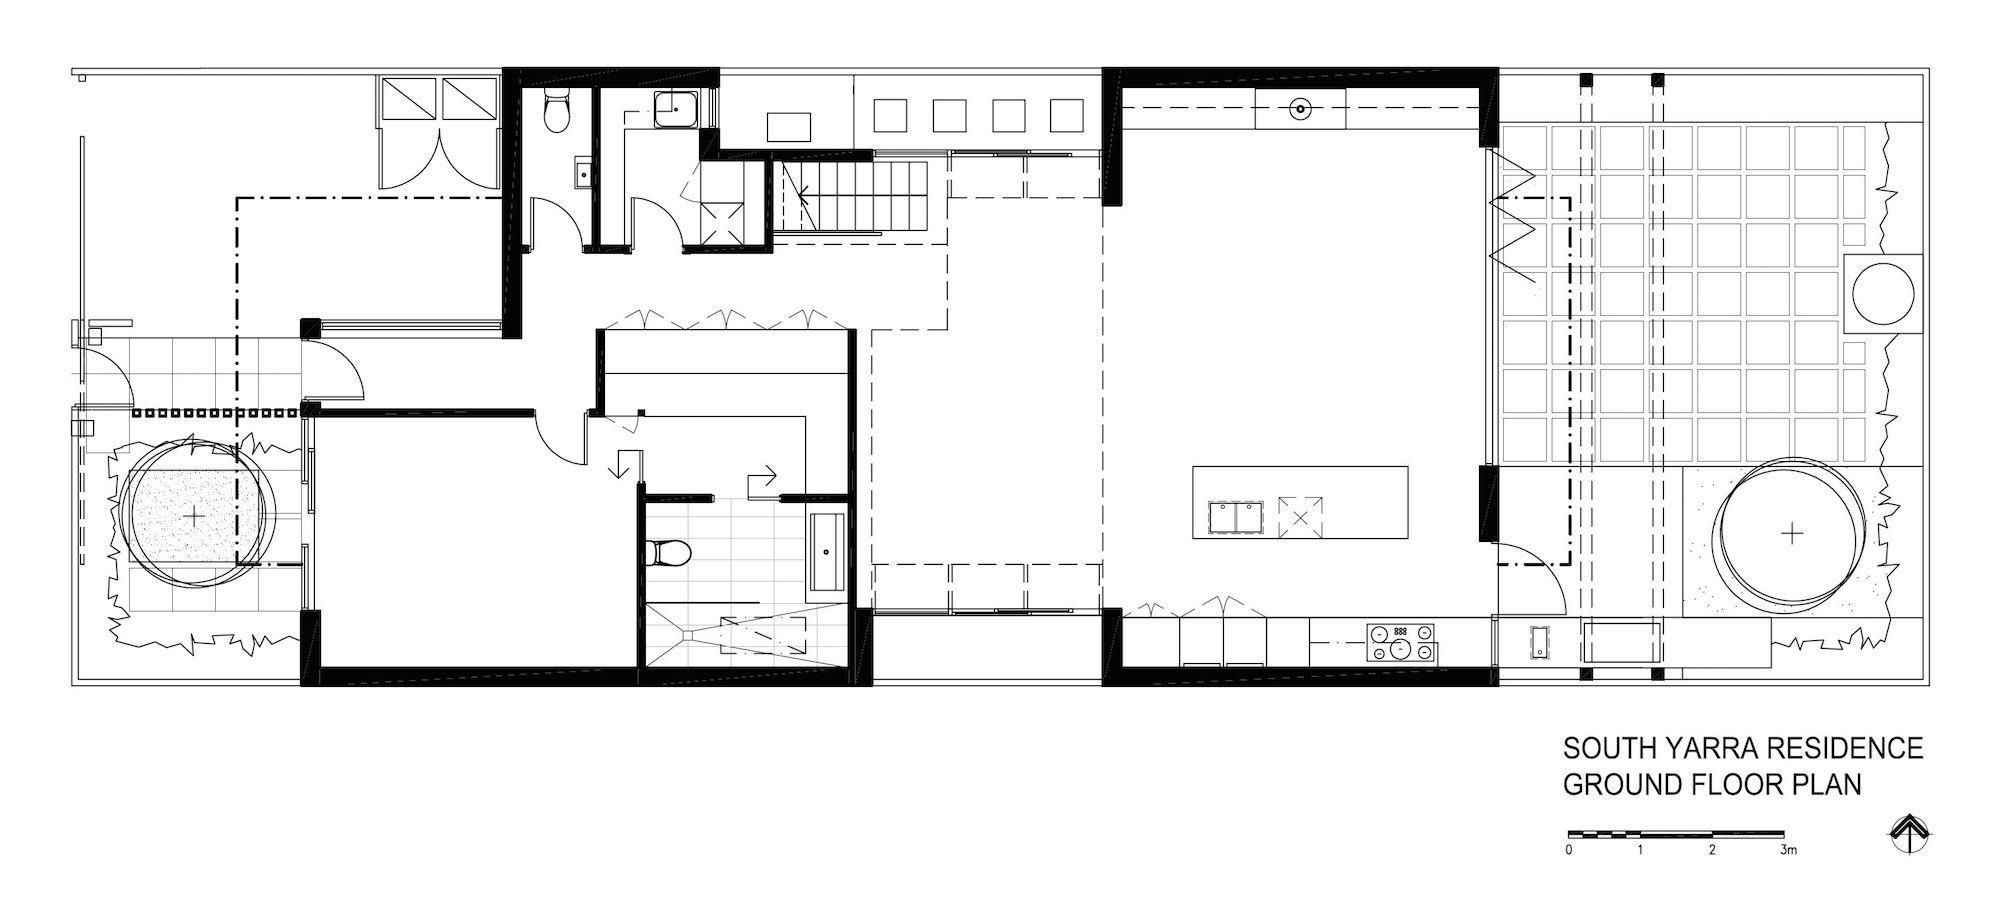 South-Yarra-Residence-11